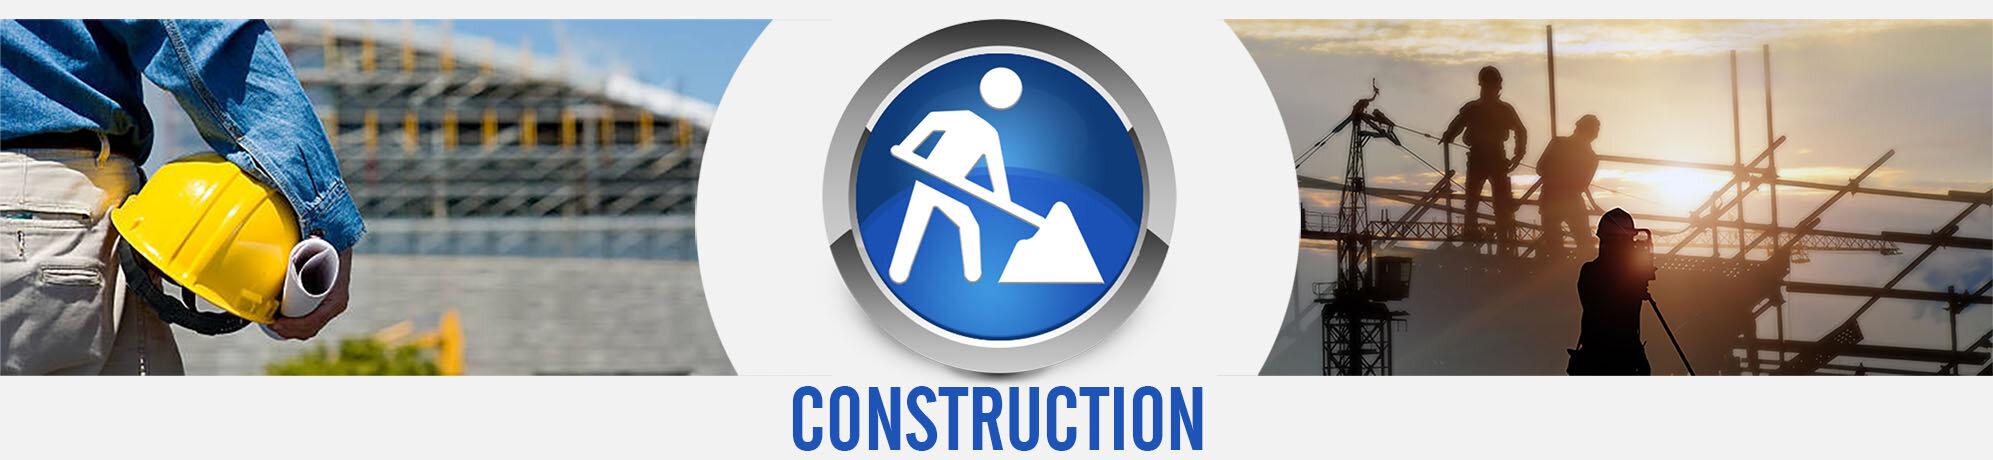 IndustryConstructionB.jpg